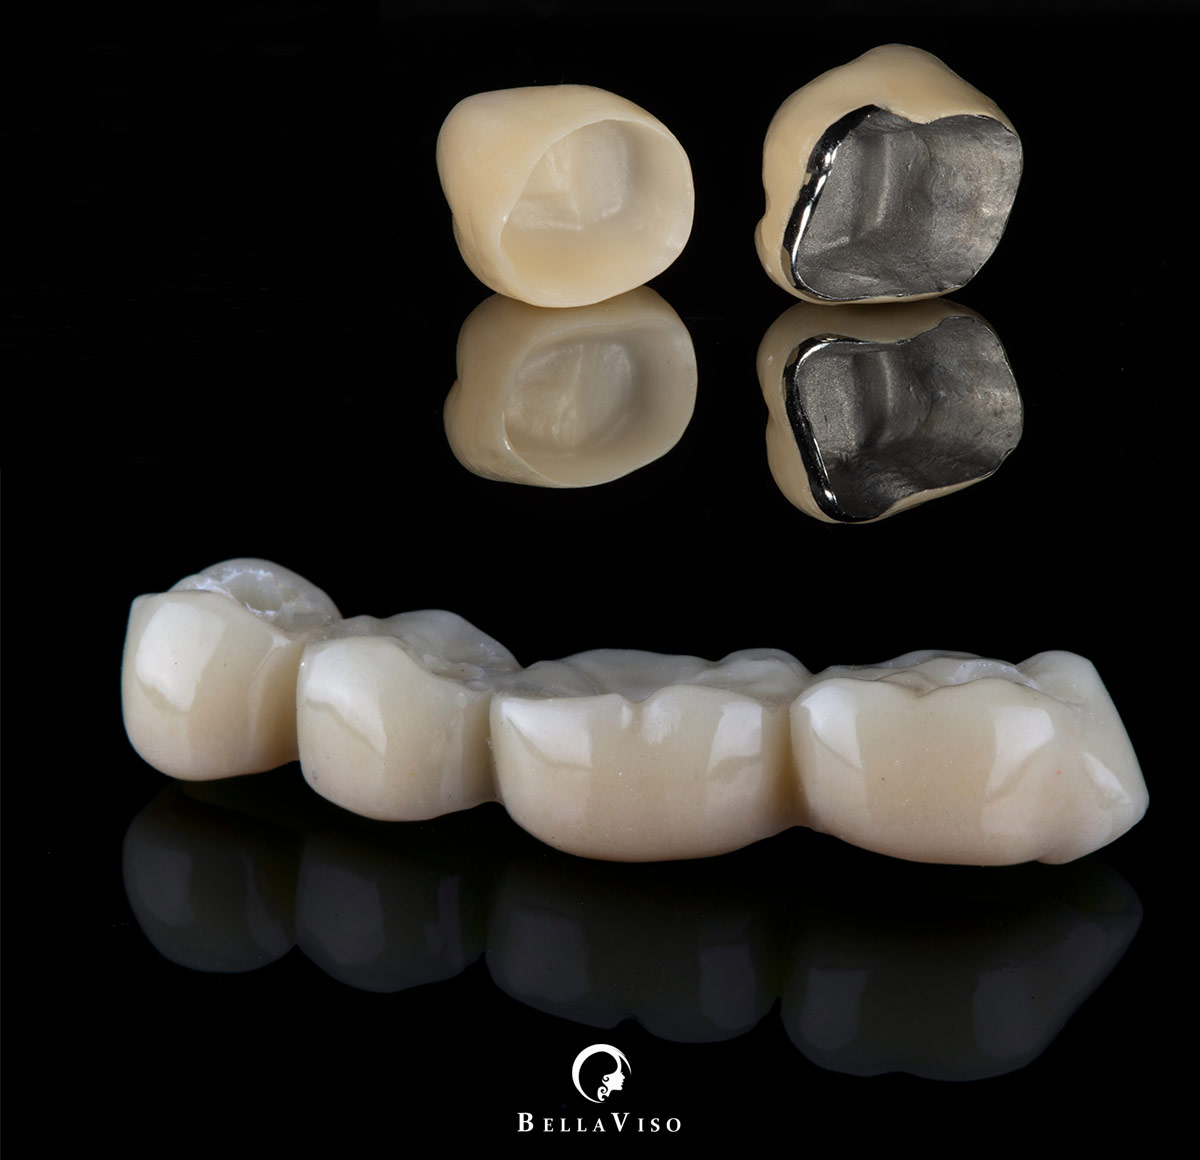 Dental Bridges and Dental Crown in Dubai